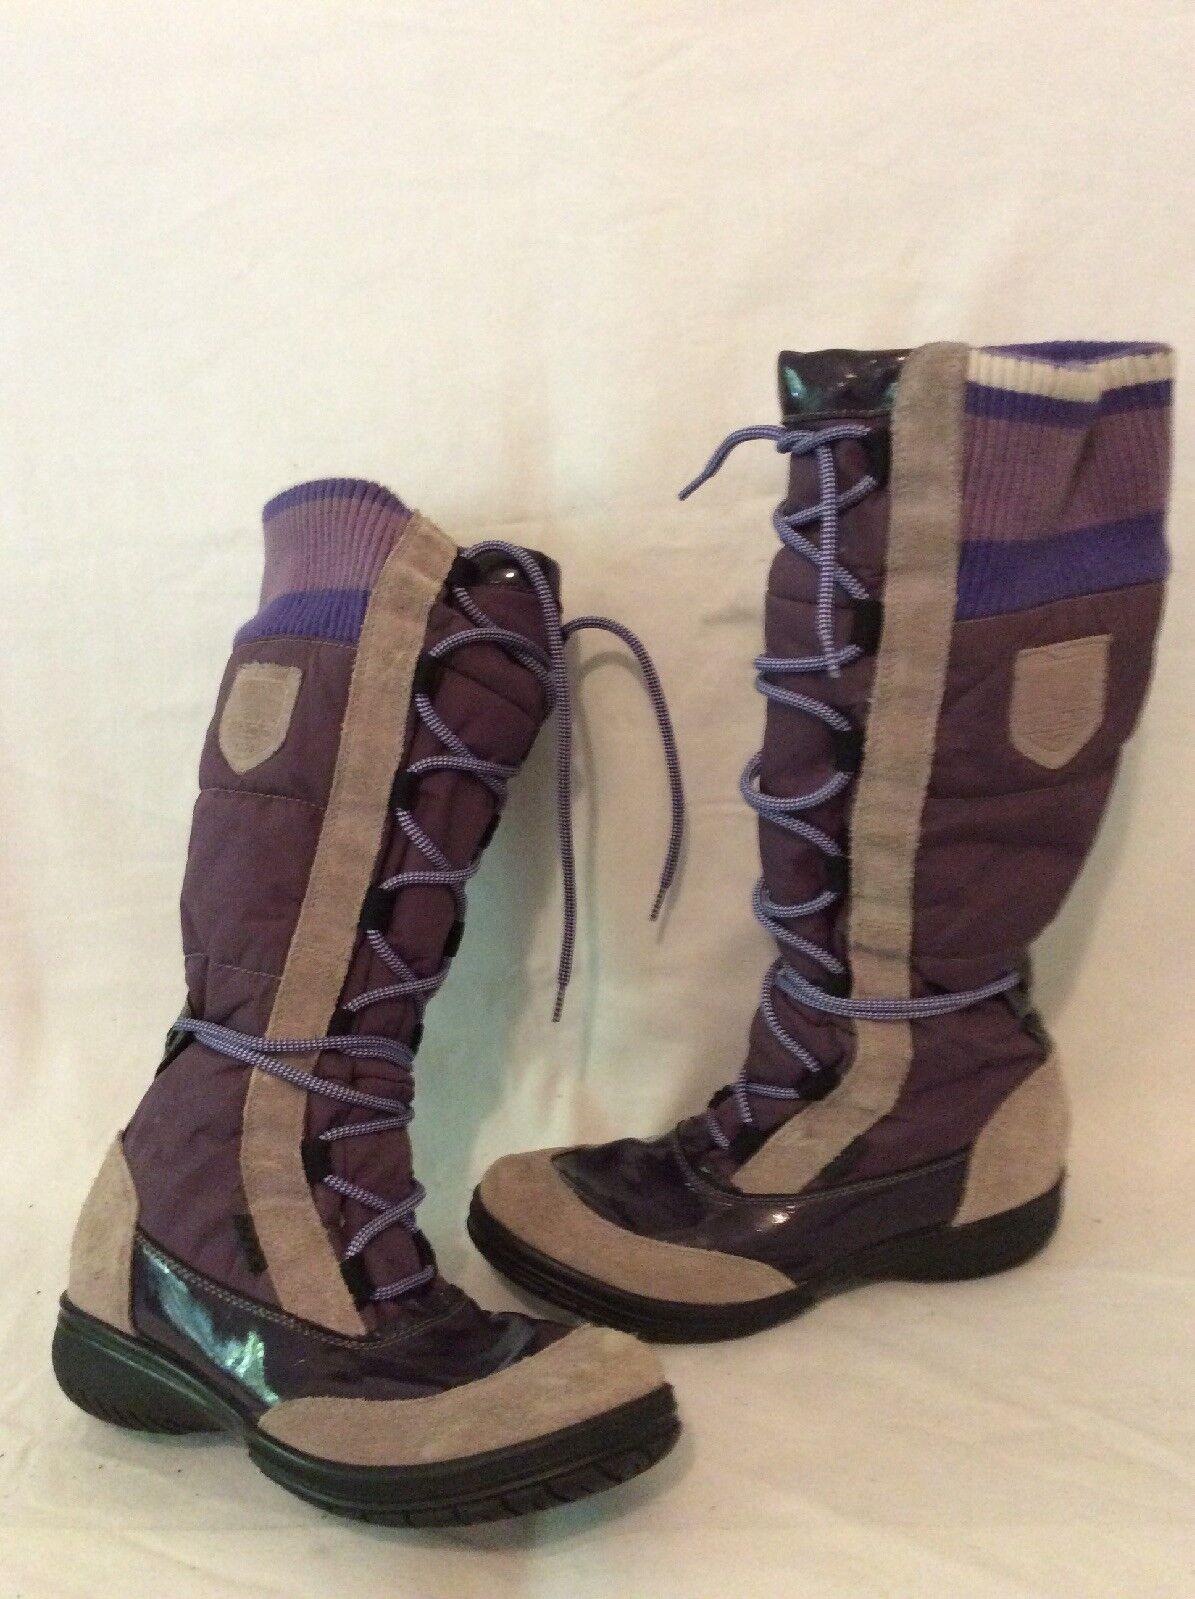 Aldo Purple Knee High Boots Size 37